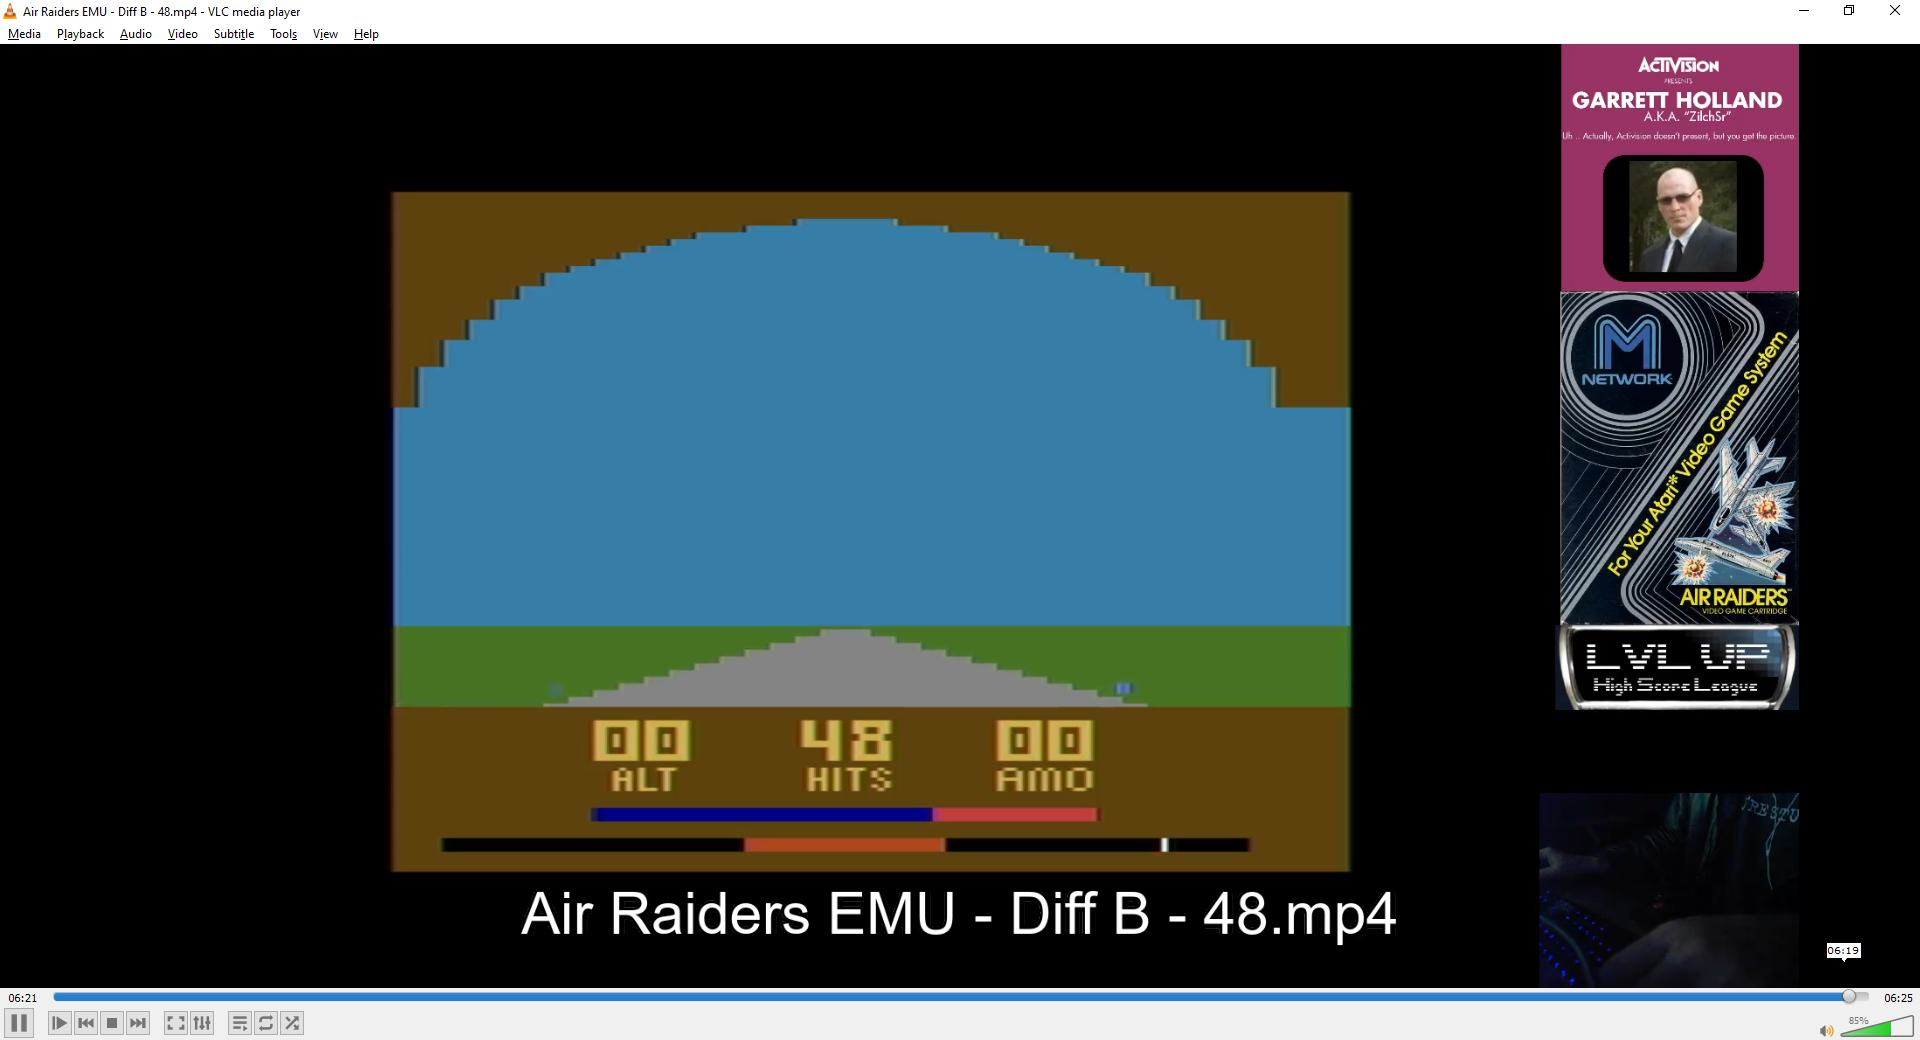 ZilchSr: Air Raiders (Atari 2600 Emulated Novice/B Mode) 48 points on 2021-02-13 16:15:20